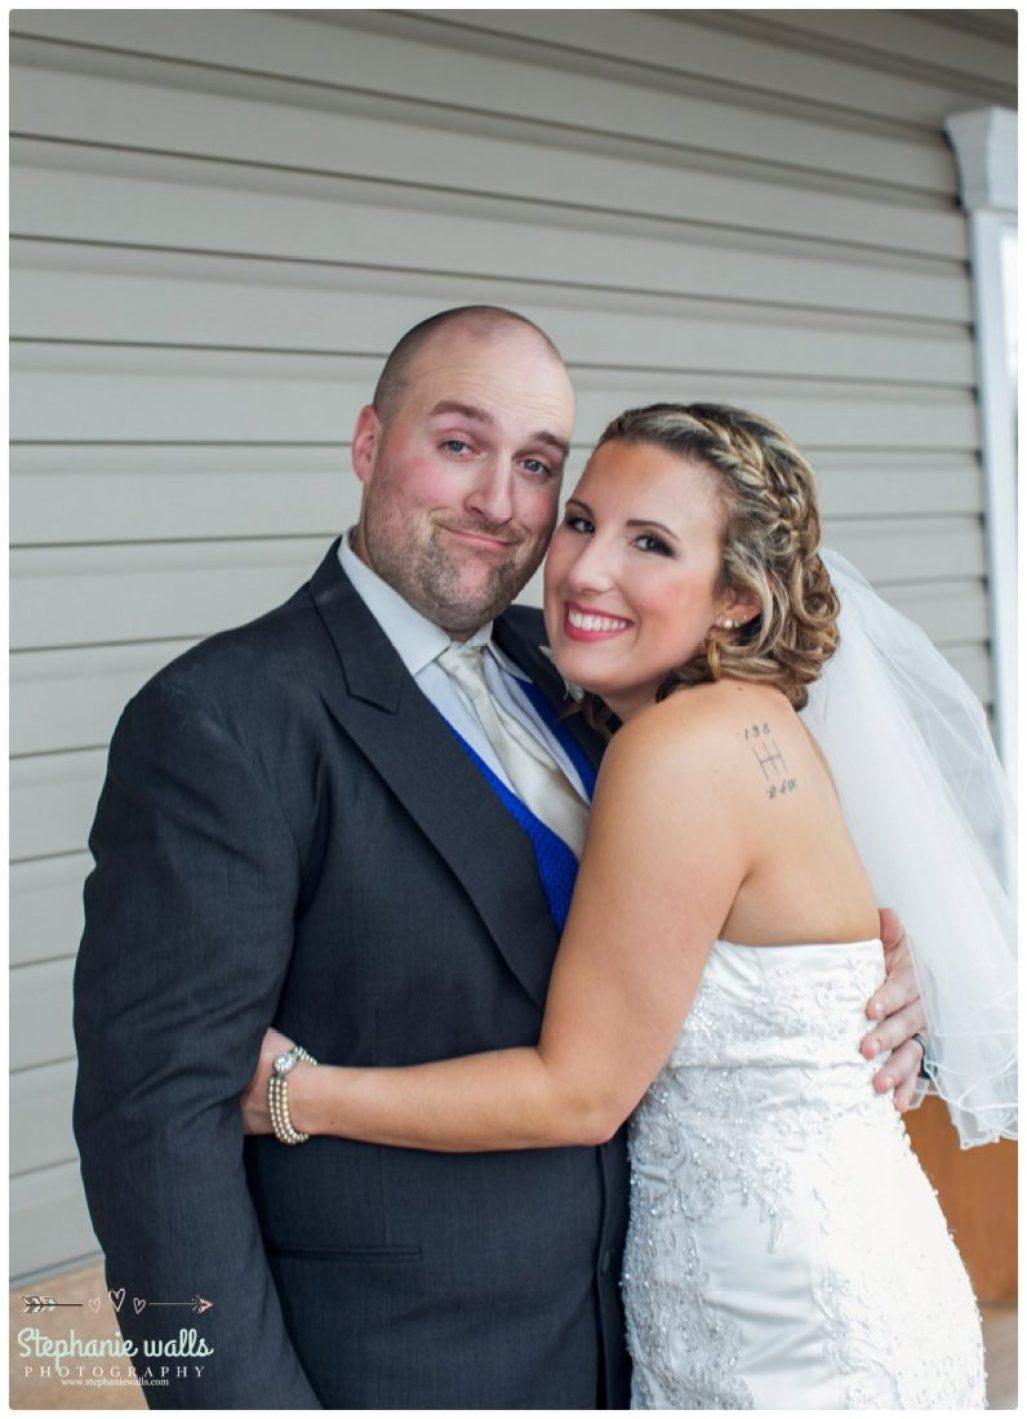 2016 03 24 0092 Racing Love   Snohomish Event Center   Snohomish Wedding Photographer